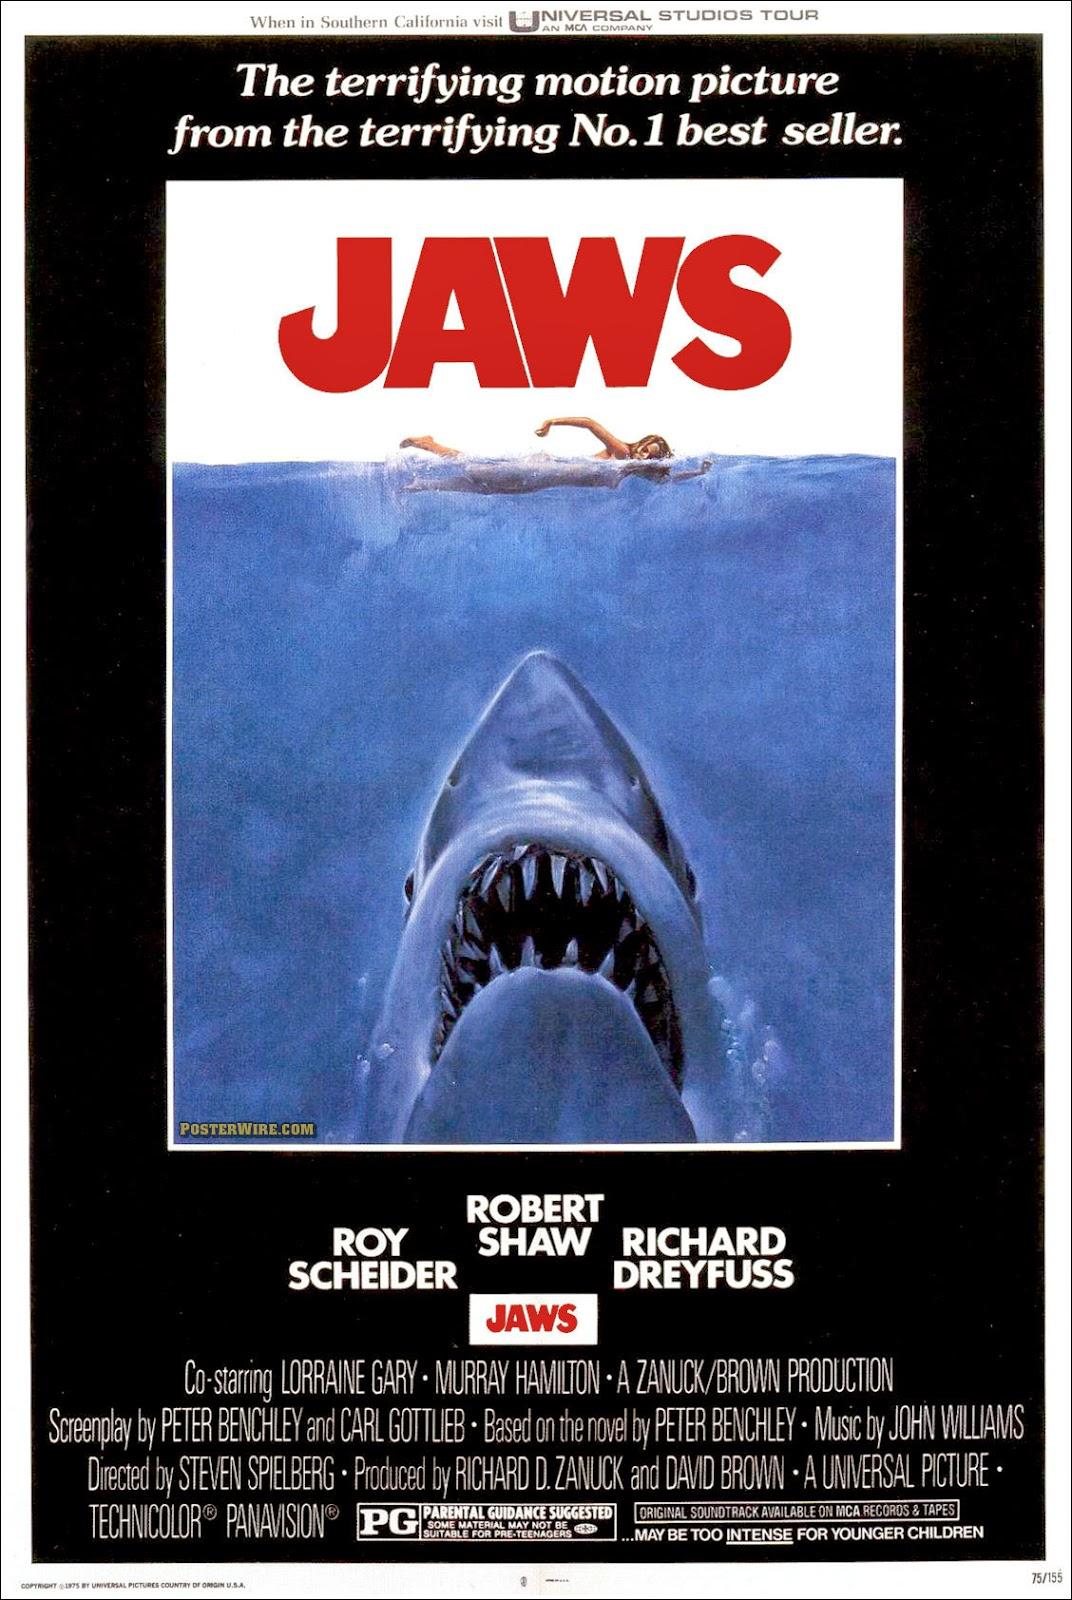 Steven Spielberg Tiburón cartel